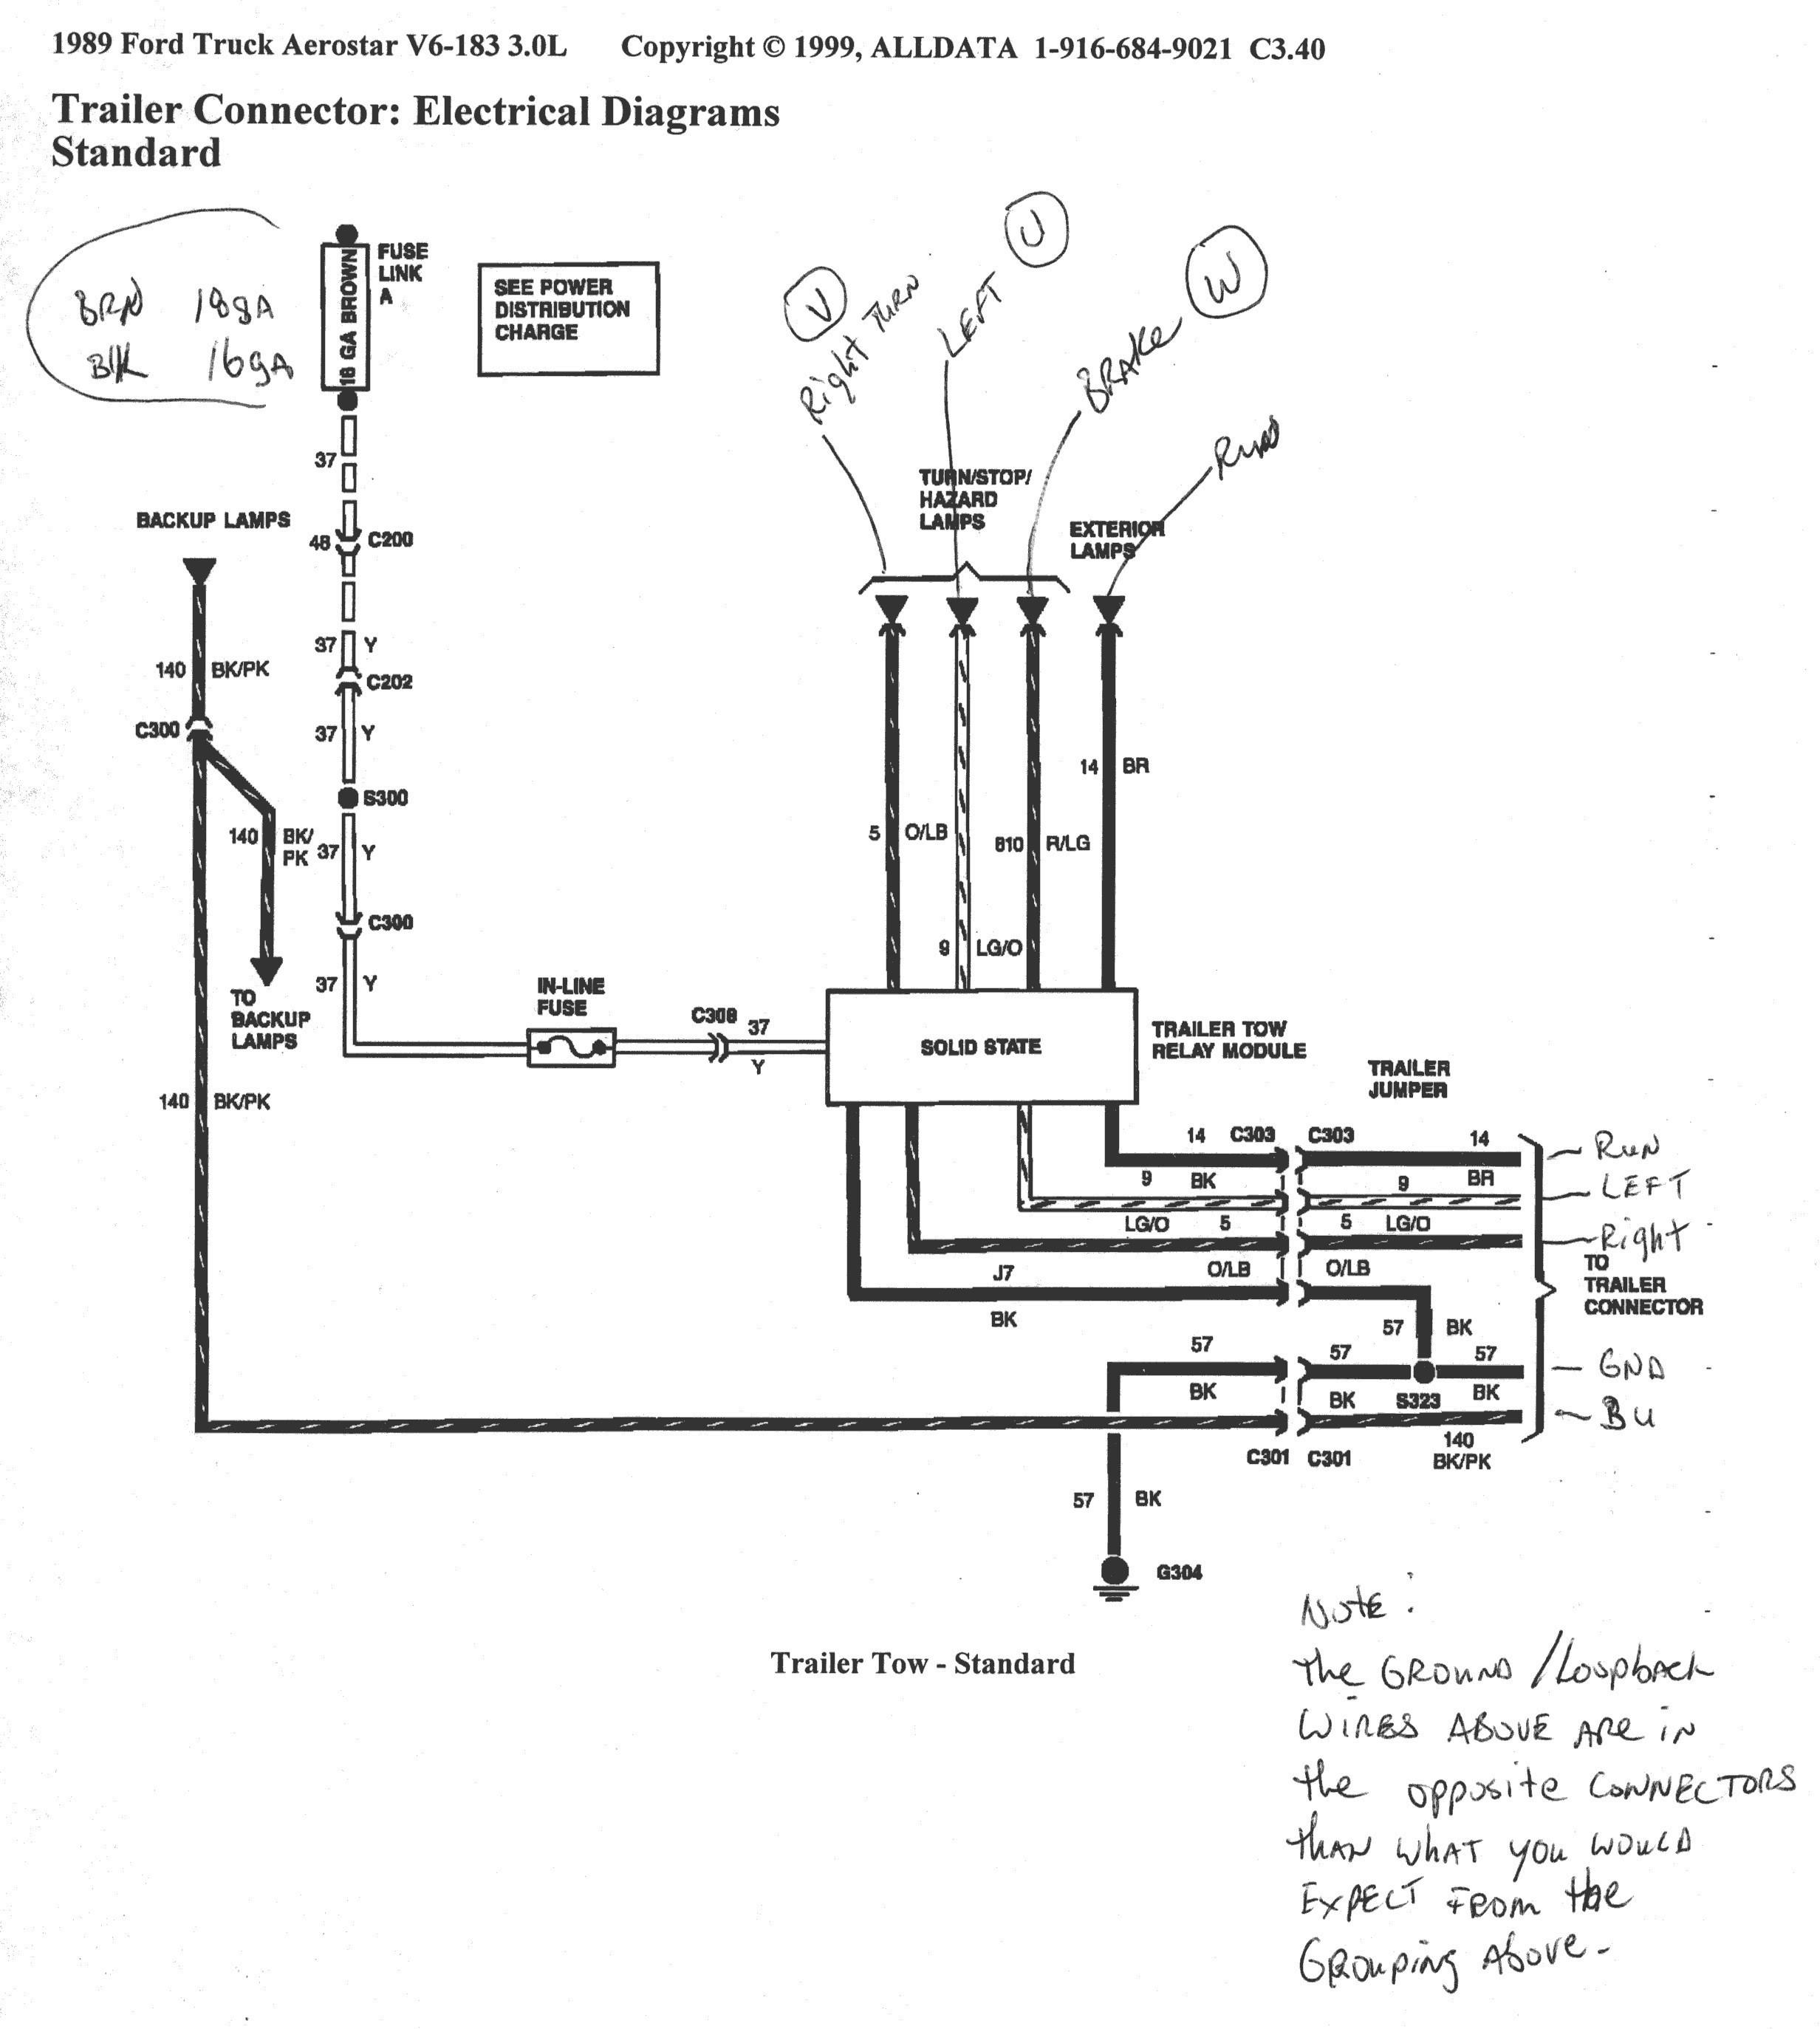 1994 Chevy Truck Brake Light Wiring Diagram Wiring Diagrams for Chevy Trucks 1997 – Wiring Diagram Collection Of 1994 Chevy Truck Brake Light Wiring Diagram